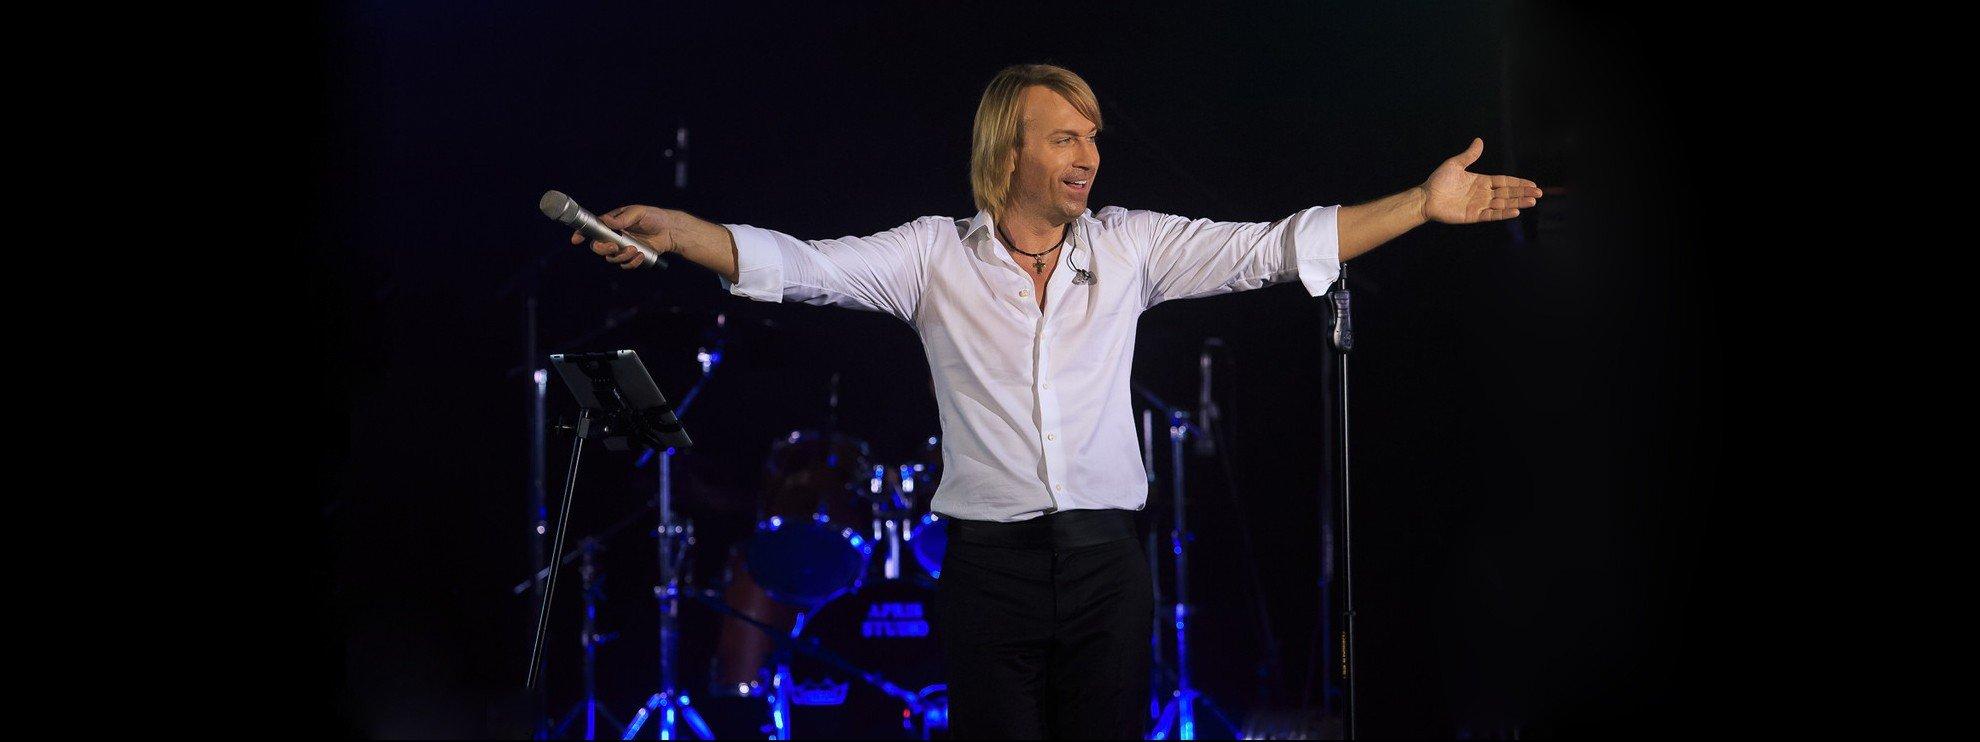 performer Oleg Vinnik